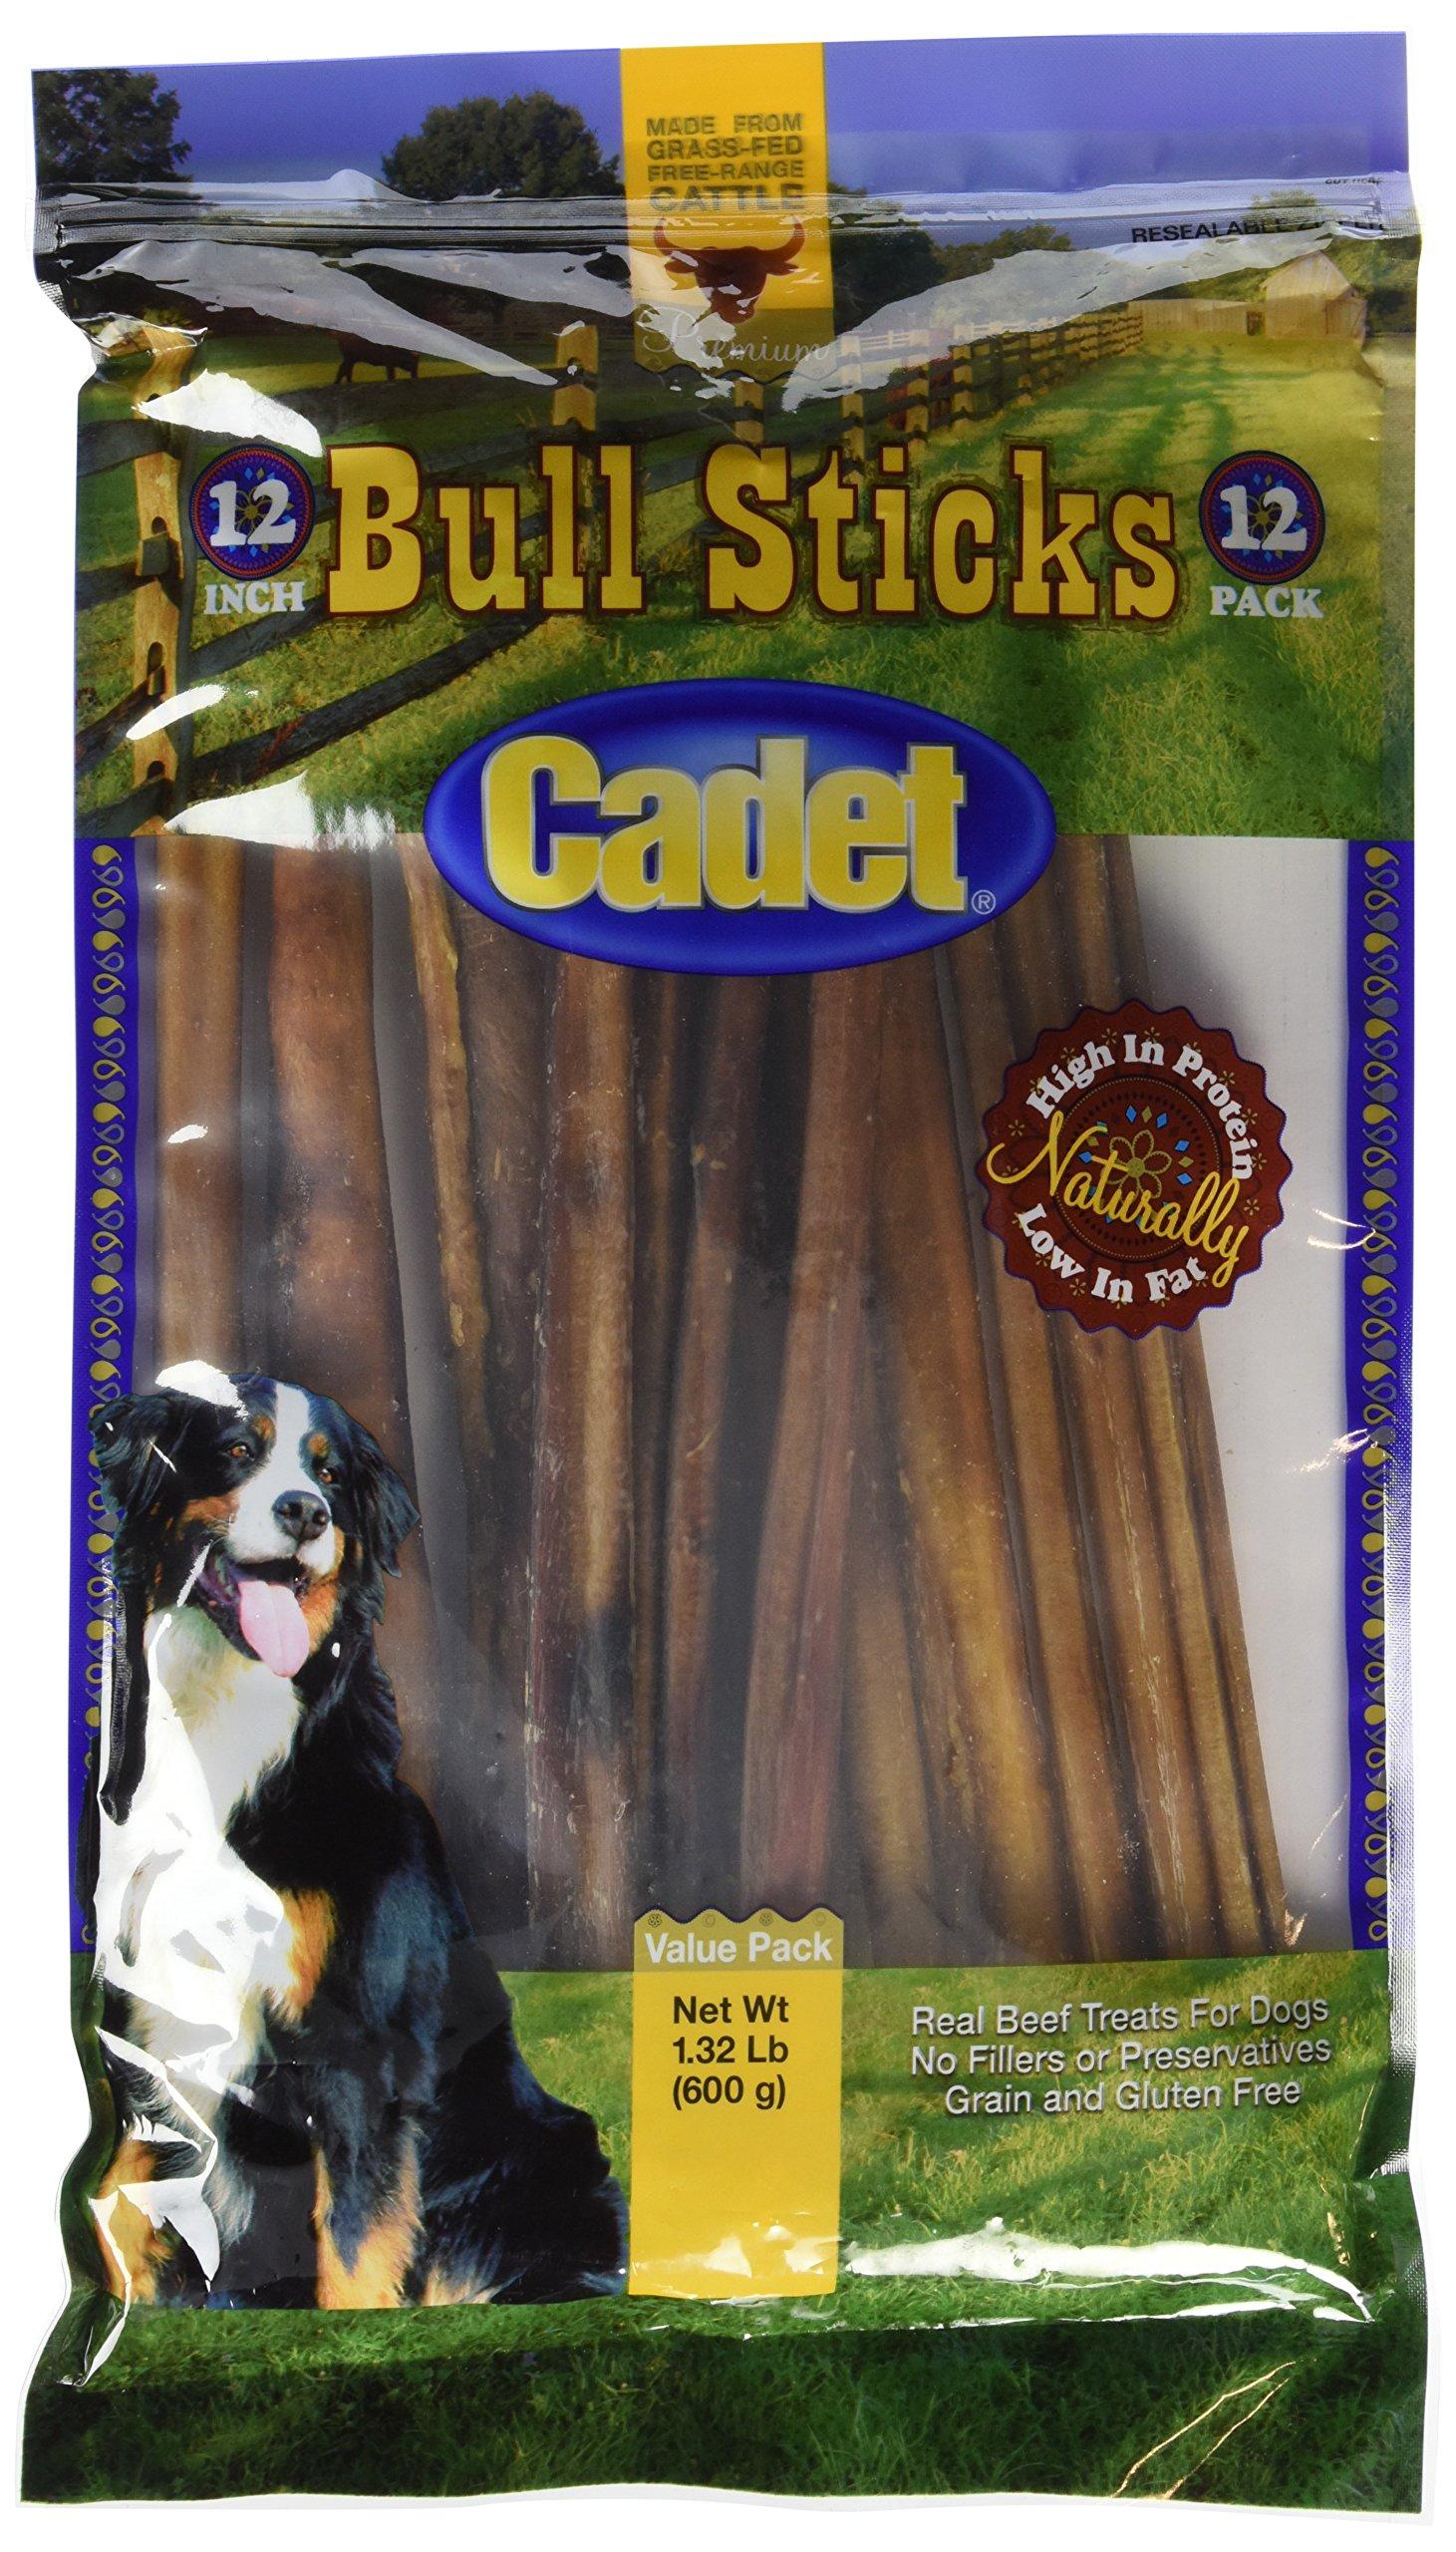 Cadet Gourmet Bully Sticks 12 Pack